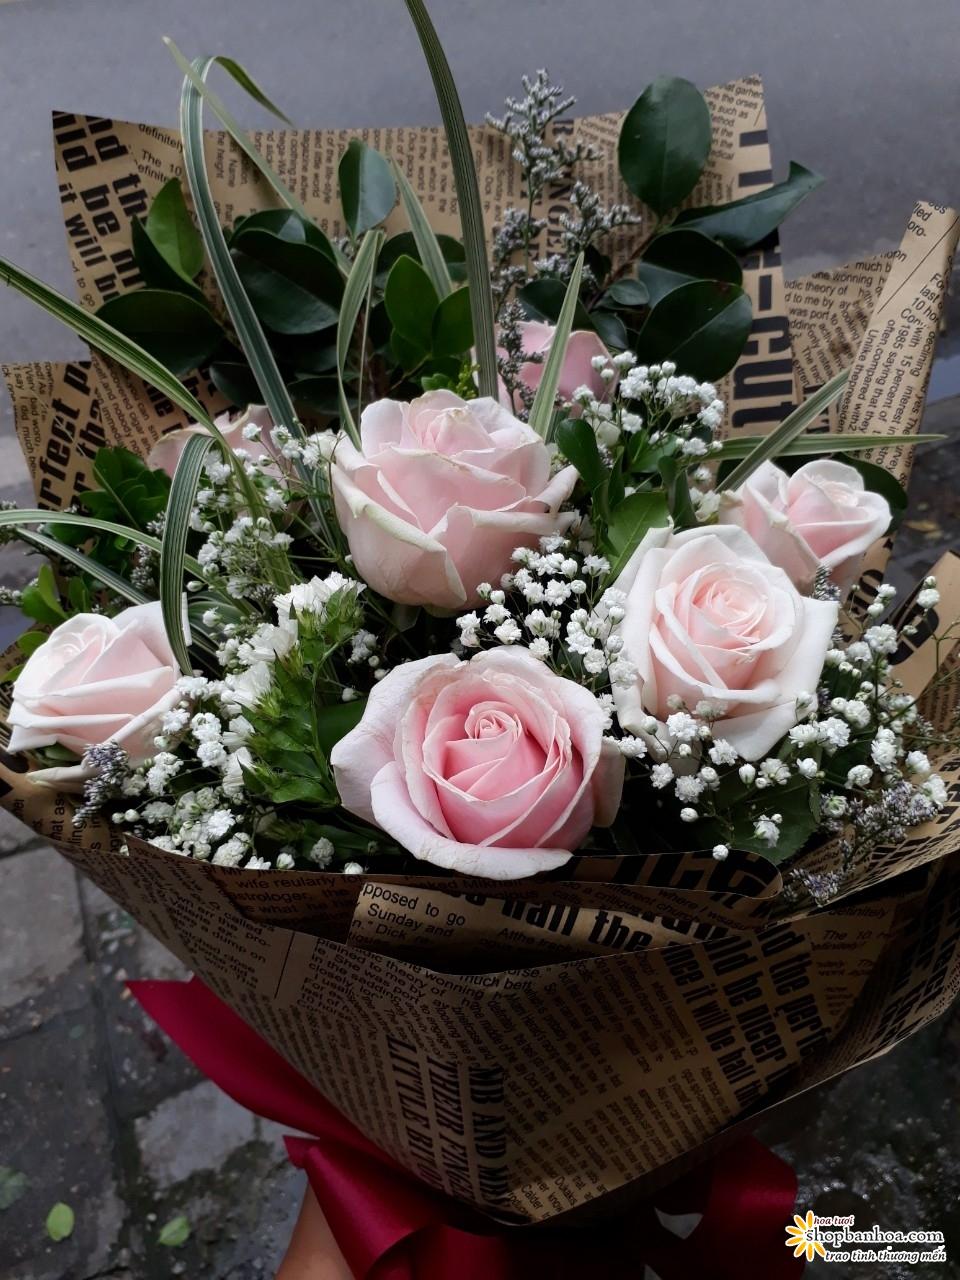 shop hoa tuoi thanh hoa    dia chi cung cap cac mau hoa cuoi dep nhat the gioi